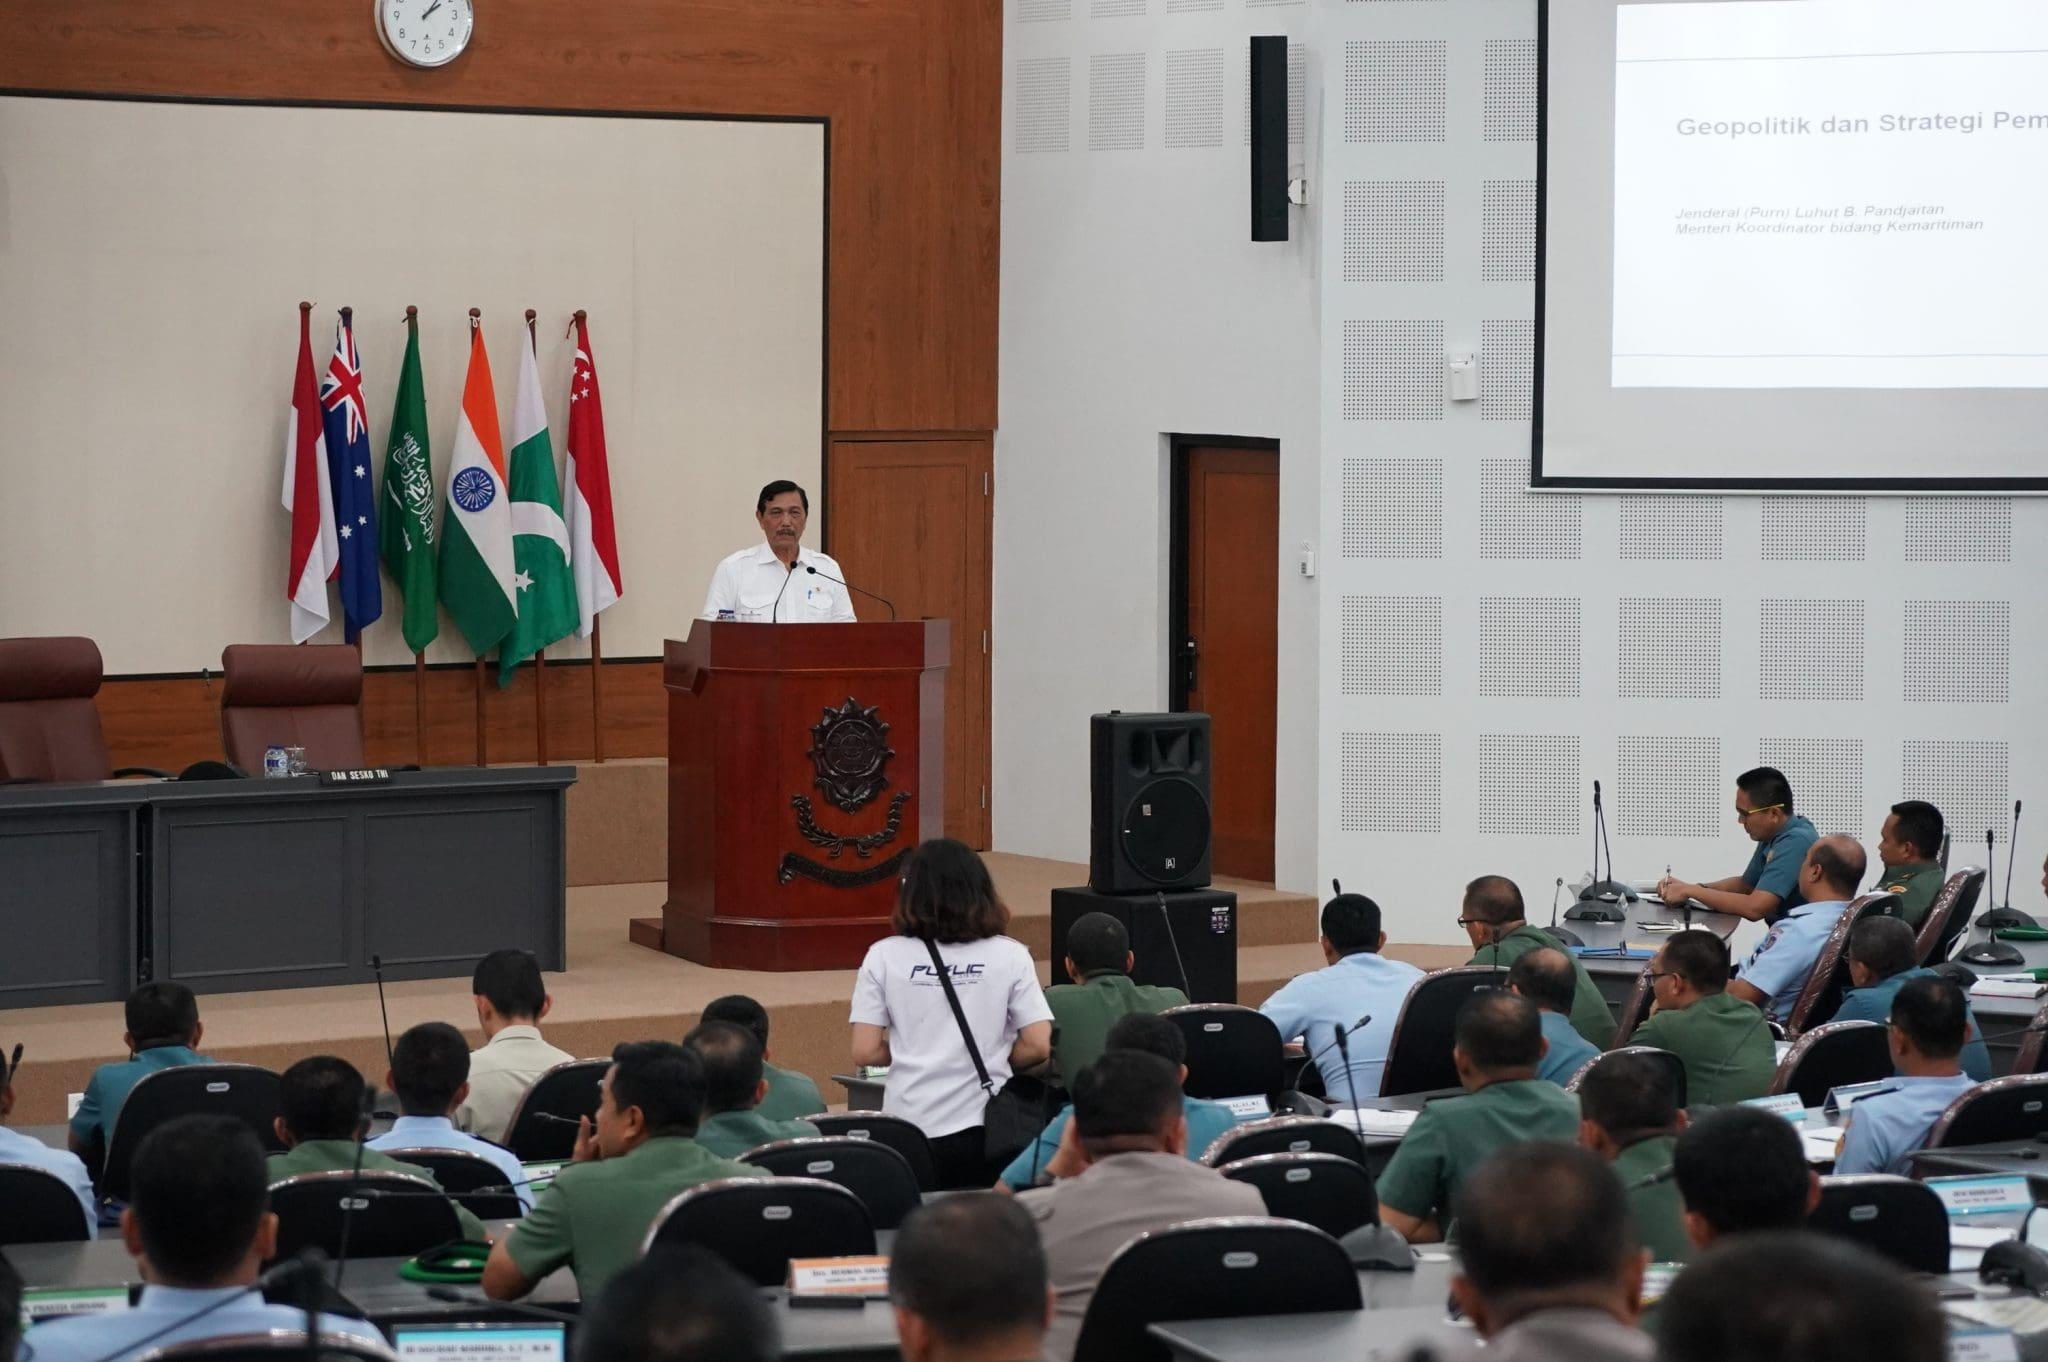 Menko Luhut Berikan Ceramah Kepada Perwira Siswa Dikreg Sesko TNI XLIV 2017